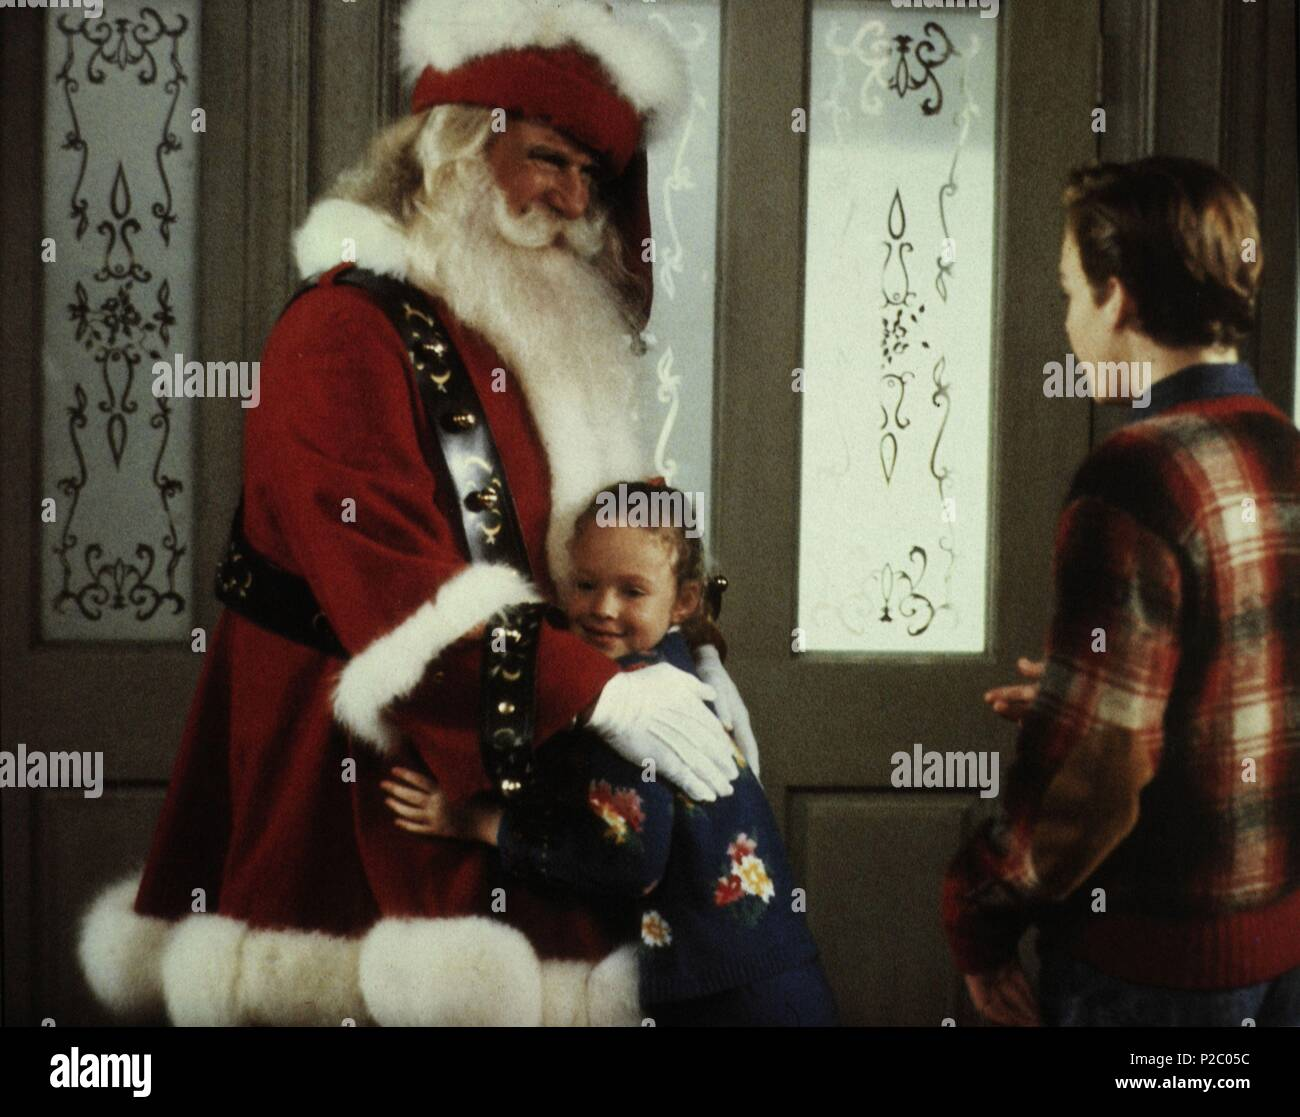 original film title all i want for christmas english title all i want for christmas film director robert lieberman year 1991 stars leslie nielsen - All I Want For Christmas Original